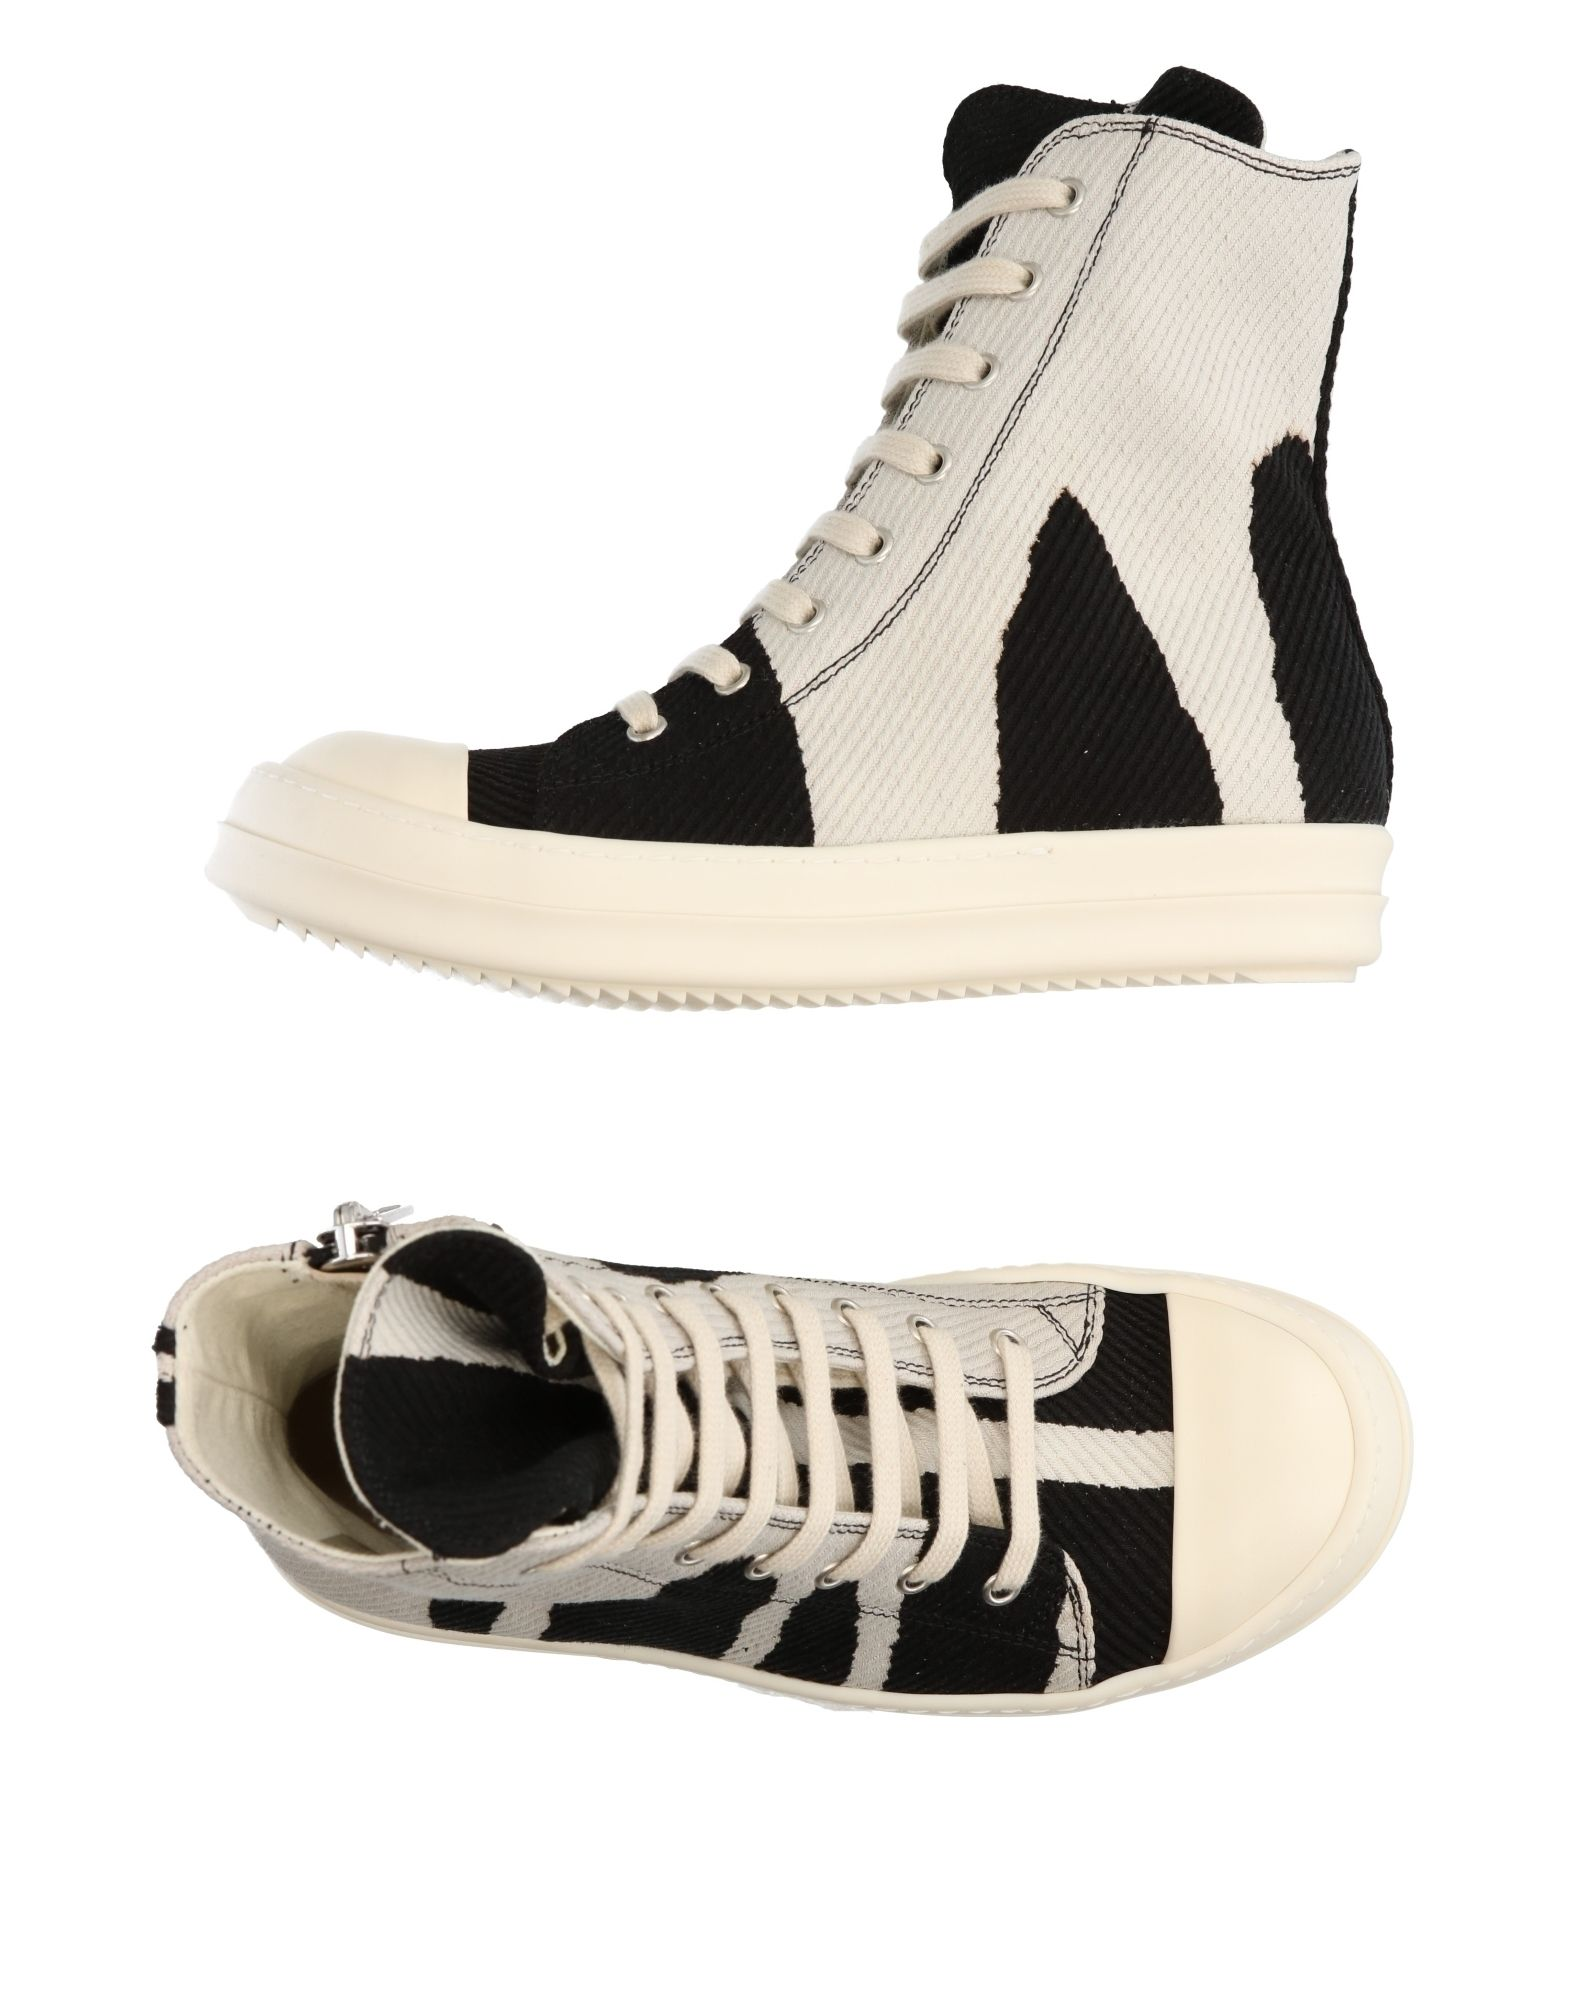 online Owens Rick By Drkshdw Acquista Sneakers Donna su 8tqSYnxB